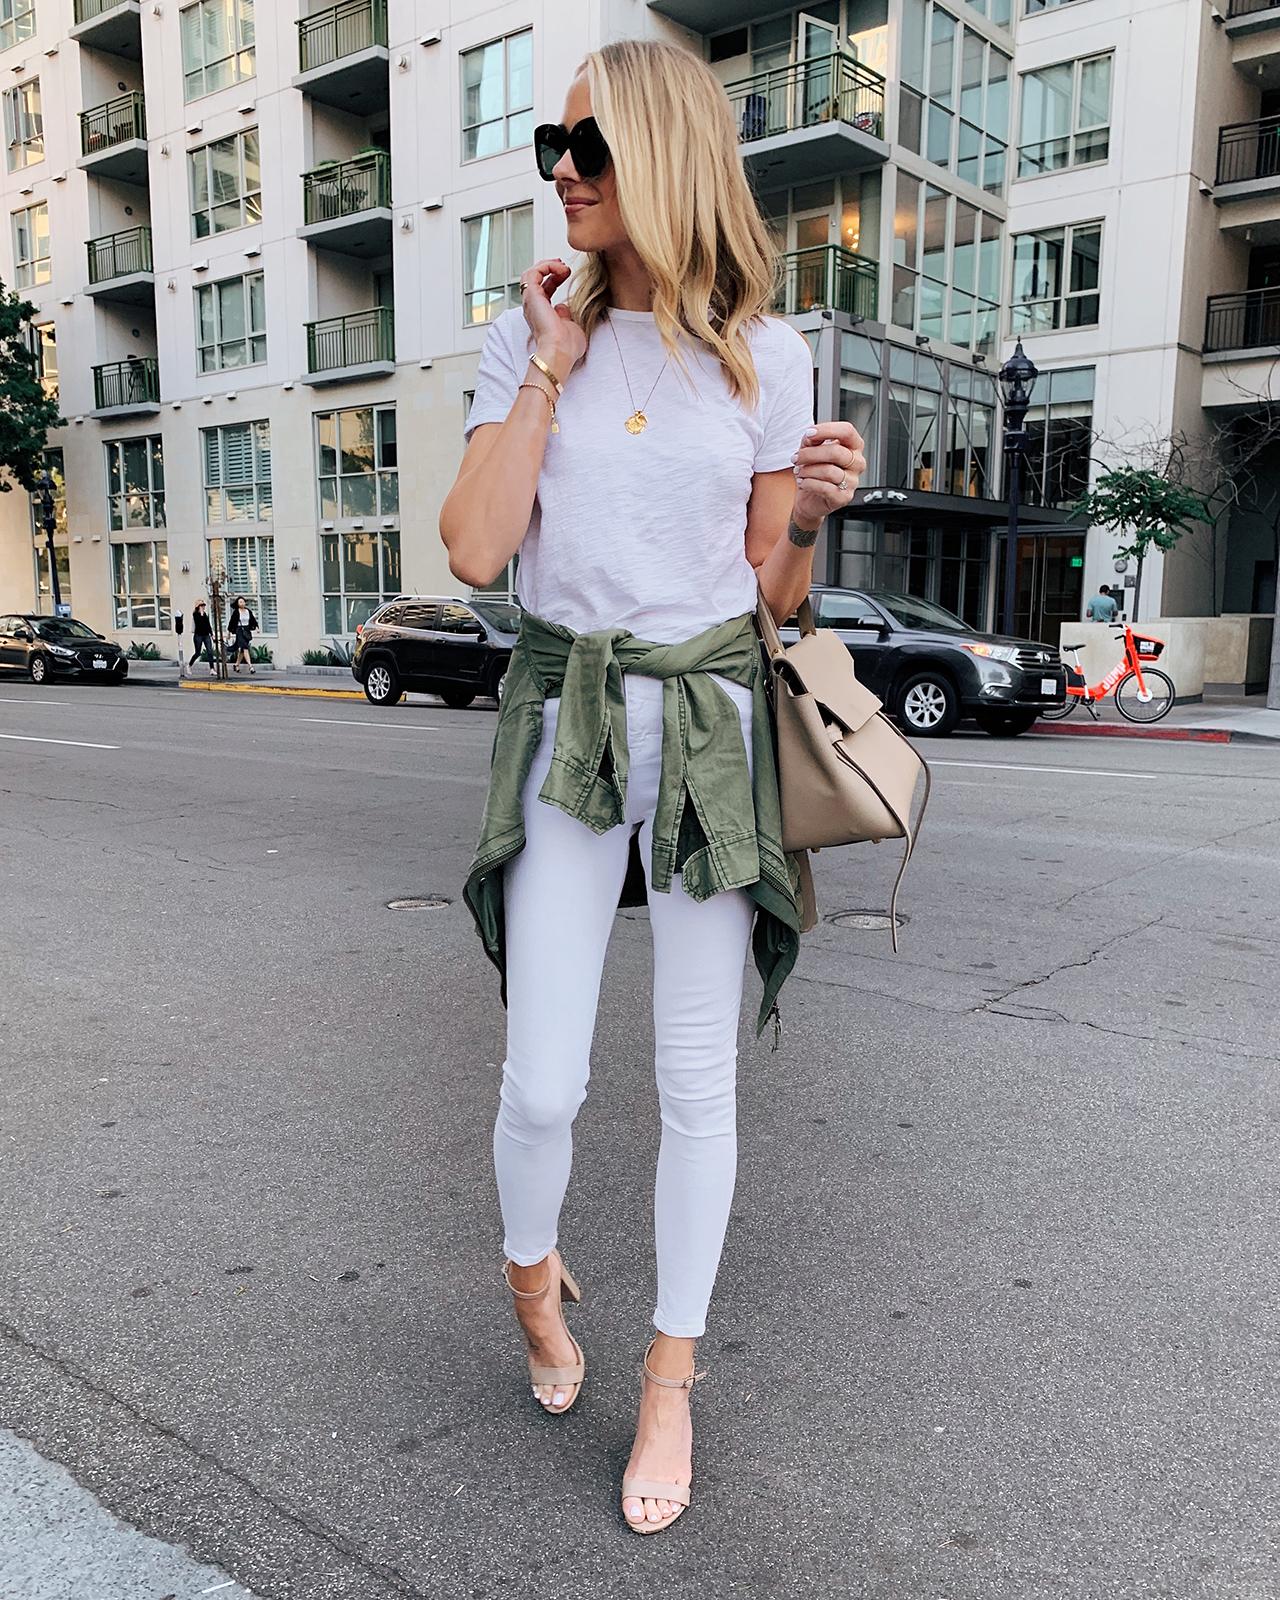 Fashion Jackson Wearing White Tshirt White Skinny Jeans Green Utility Jacket Tan Heeled Sandals